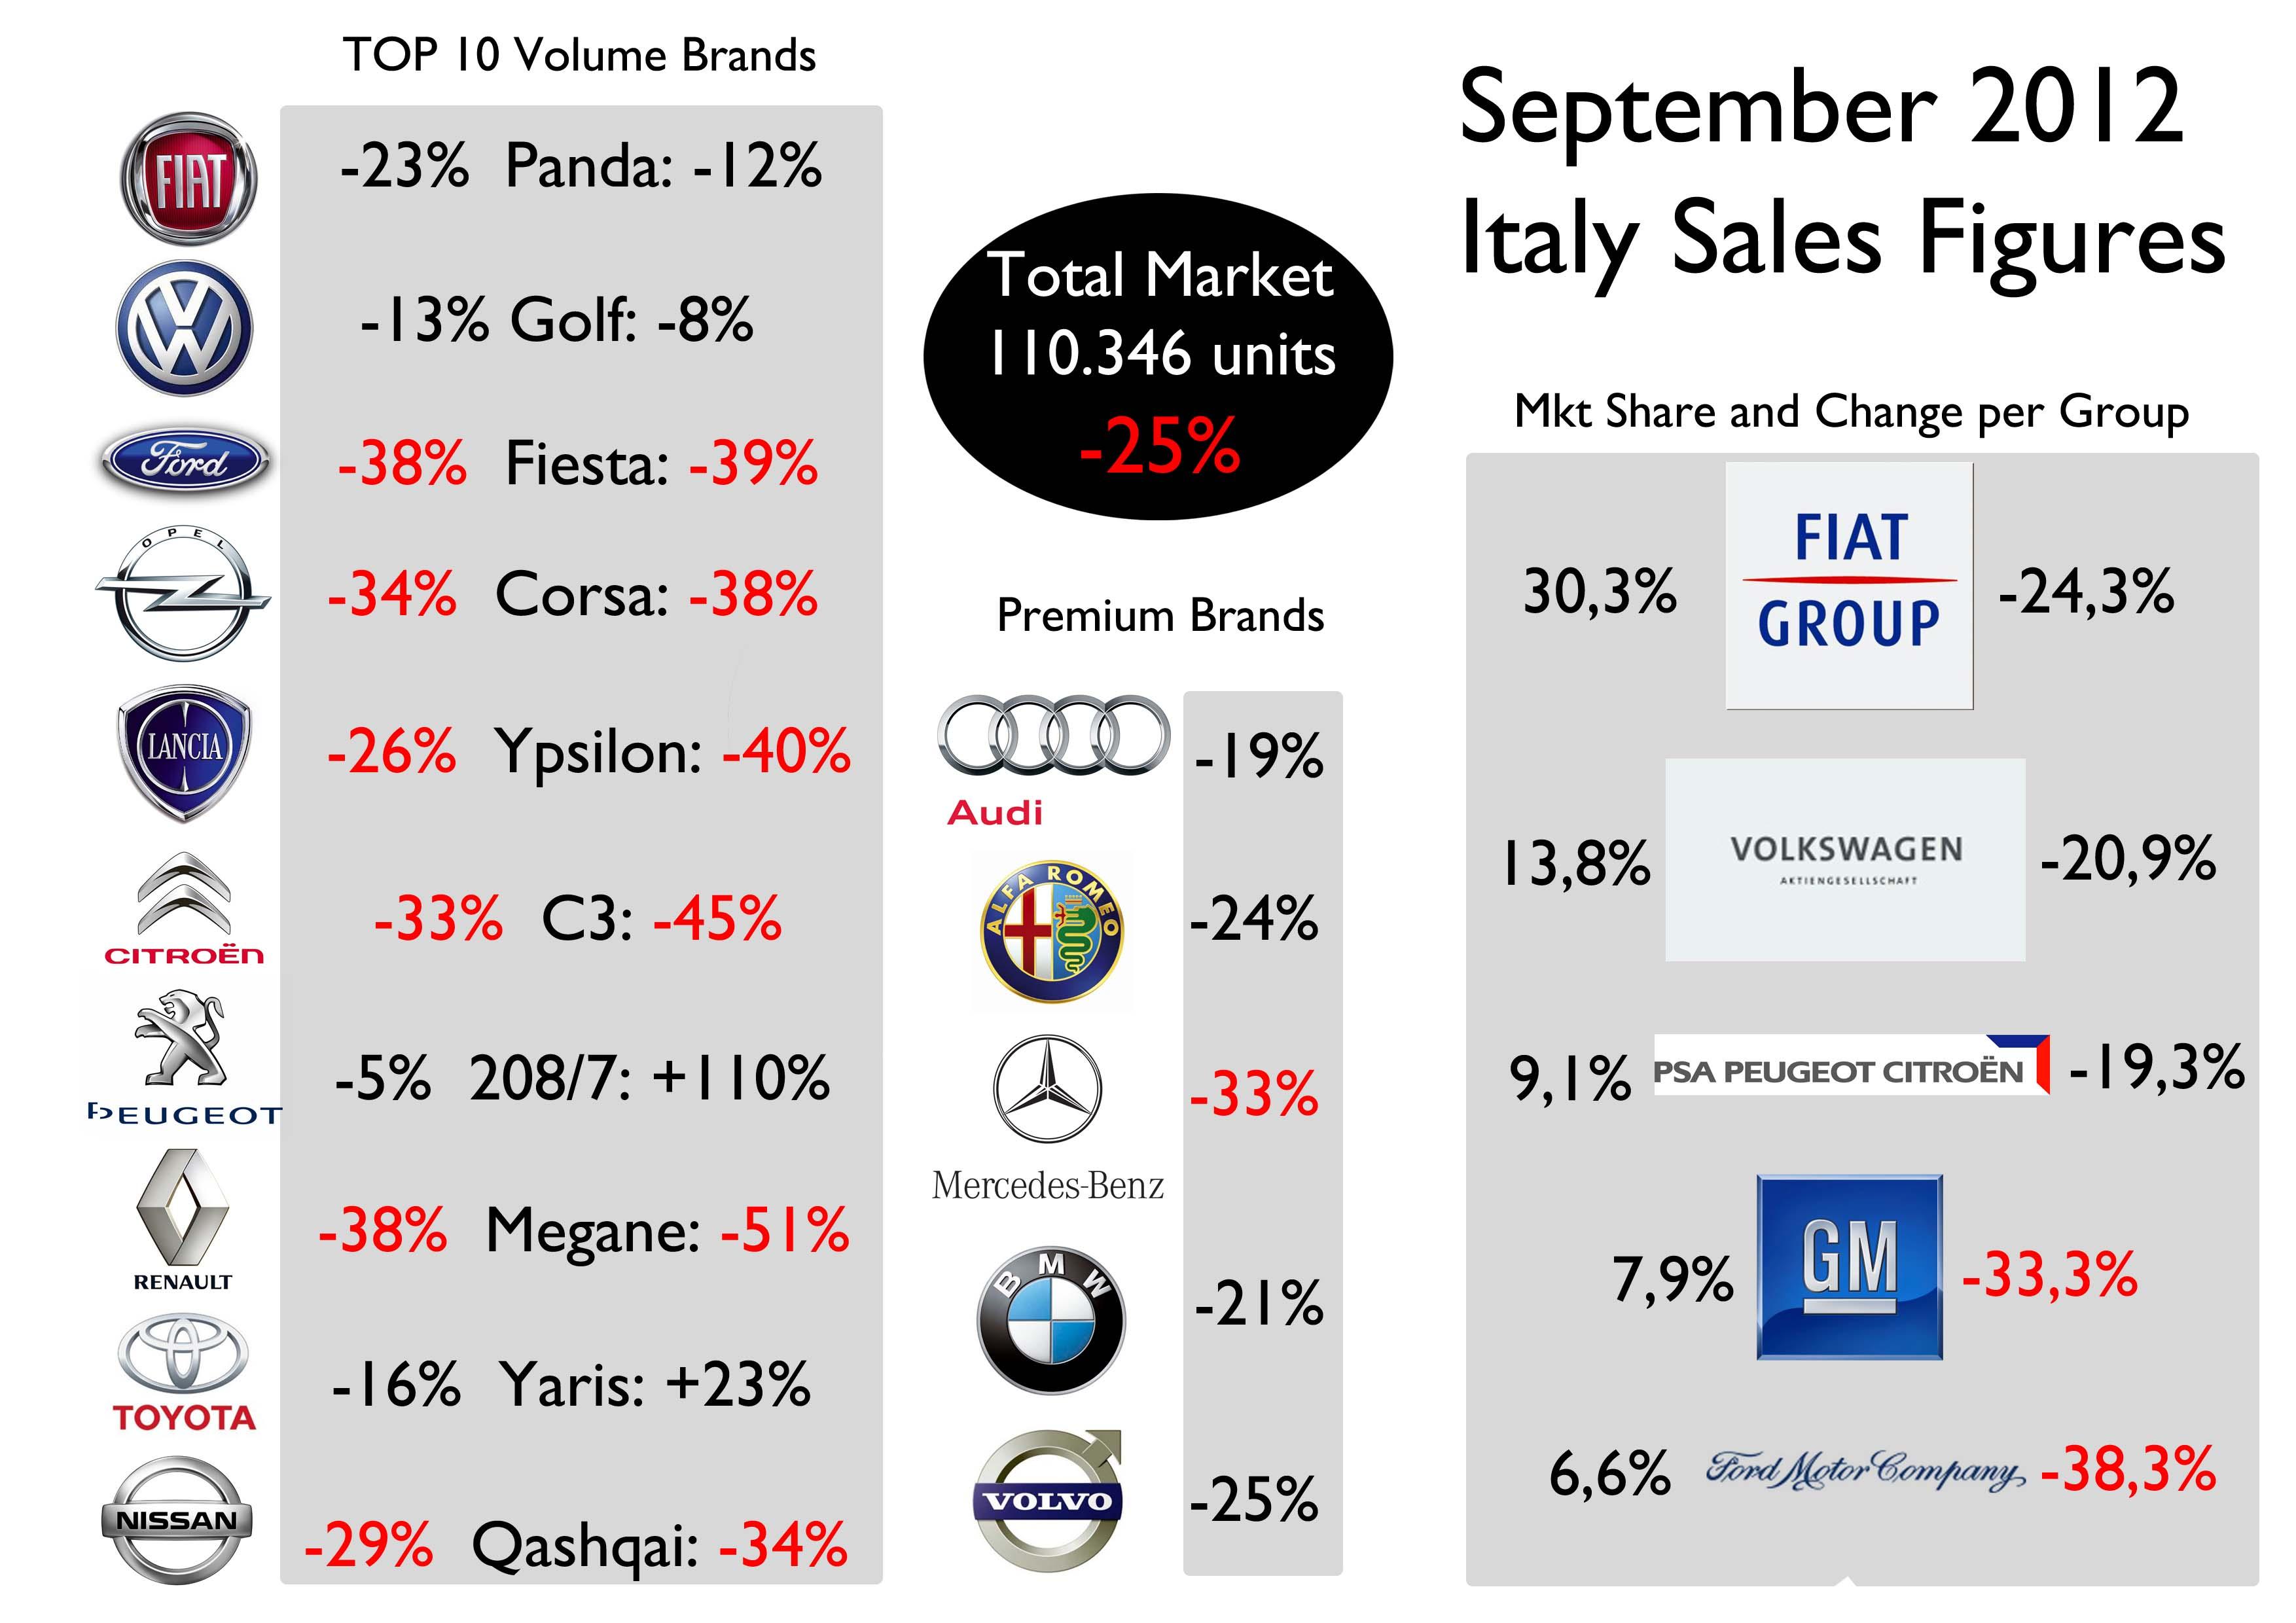 Italian car market sinks. Fiat Group down 24% | Fiat Group's World